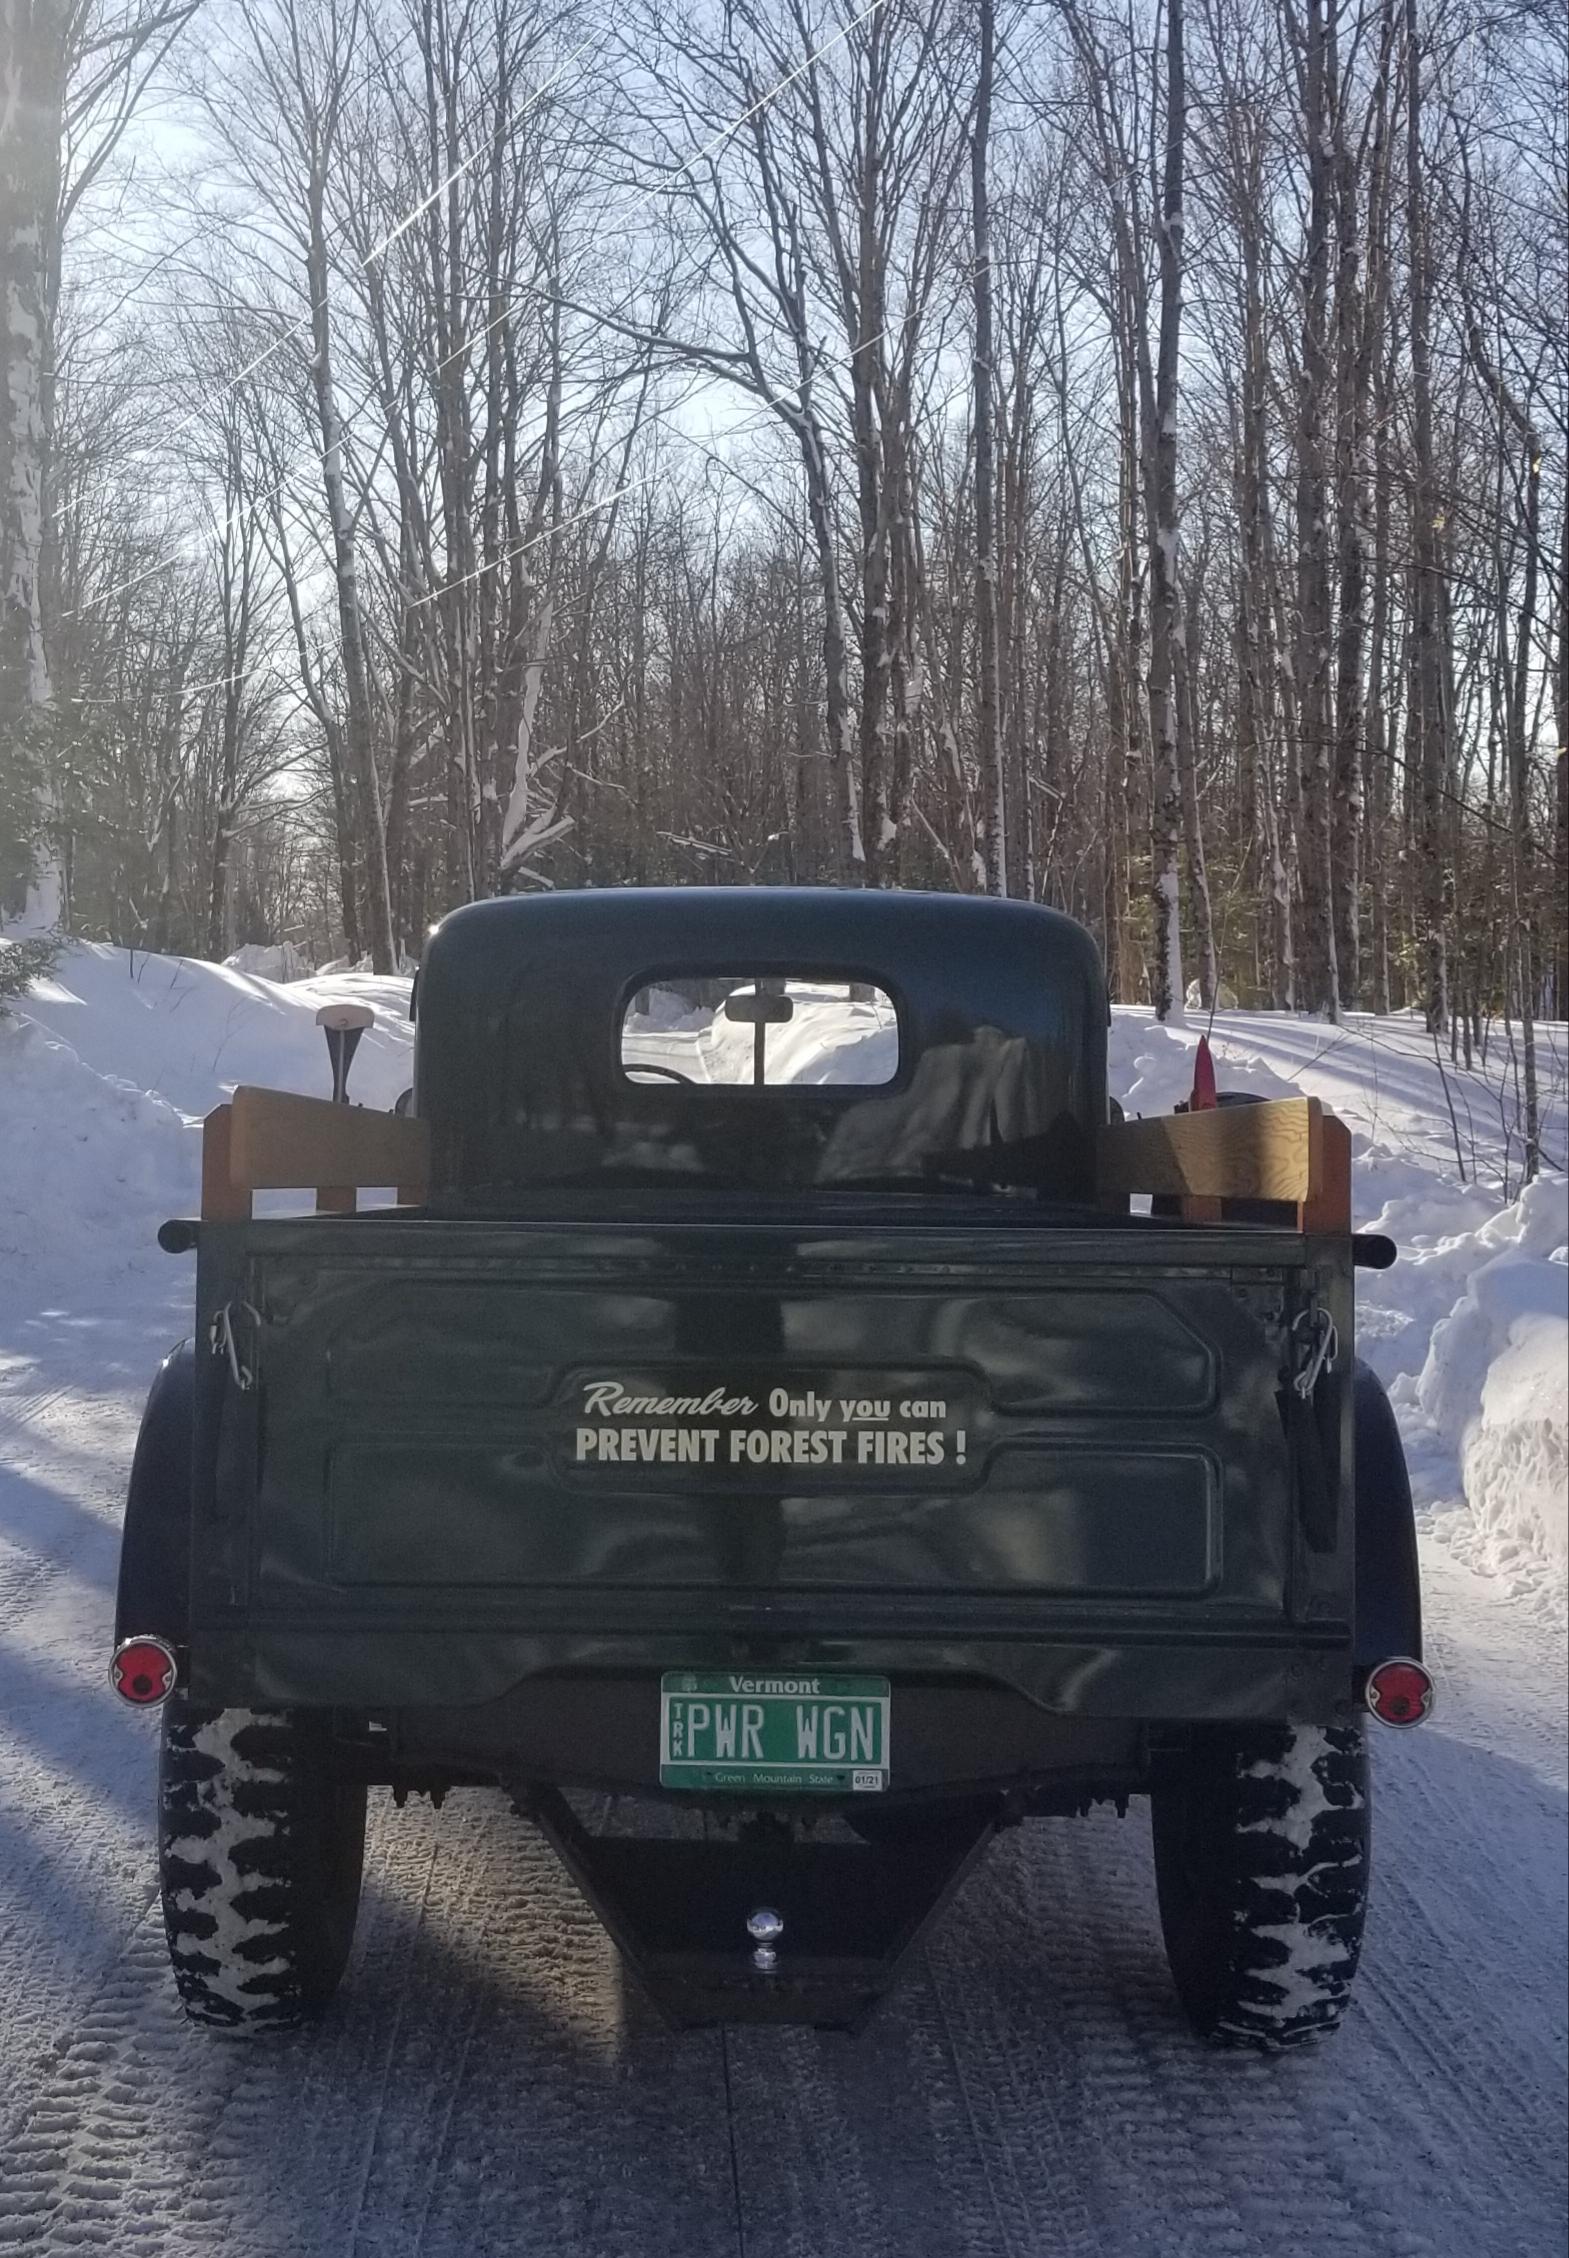 1956 Dodge Power Wagon rear